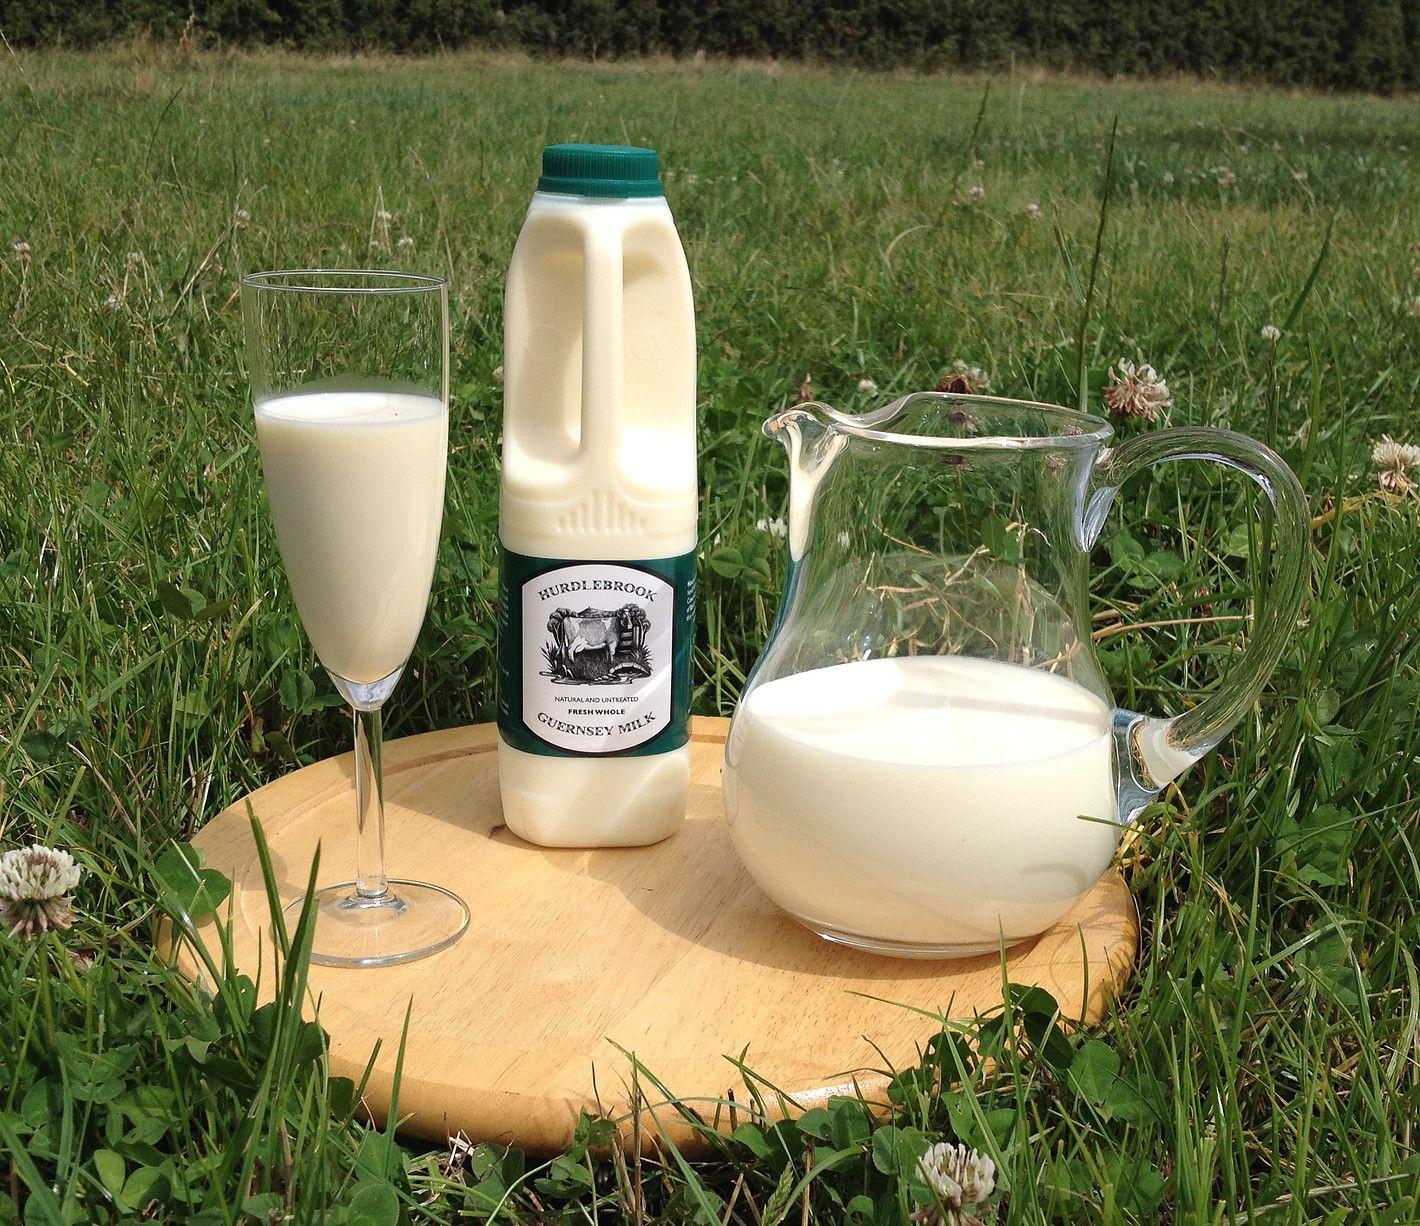 Raw milk UK hurdlebrook Guernsey (a2) Nourishing